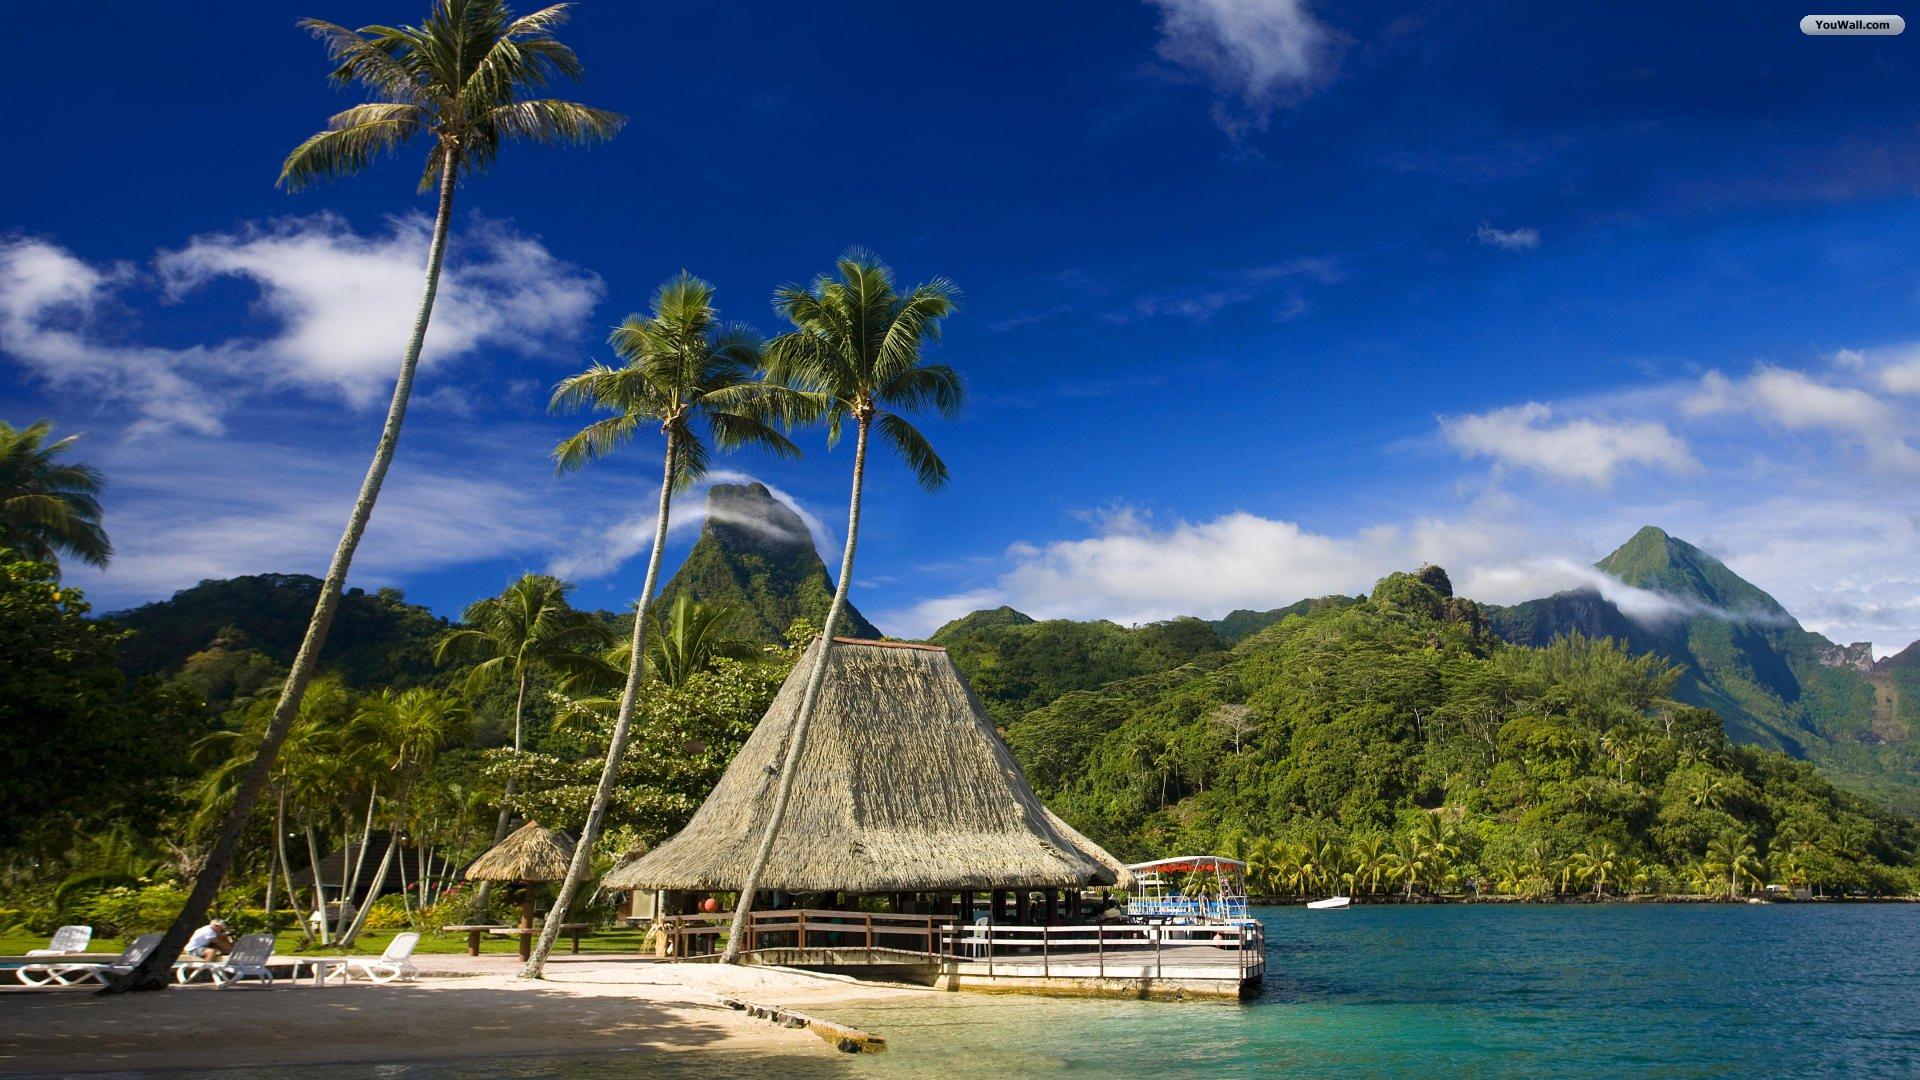 Pin Hd Tropical Island Beach Paradise Wallpapers 1920x1080 ...